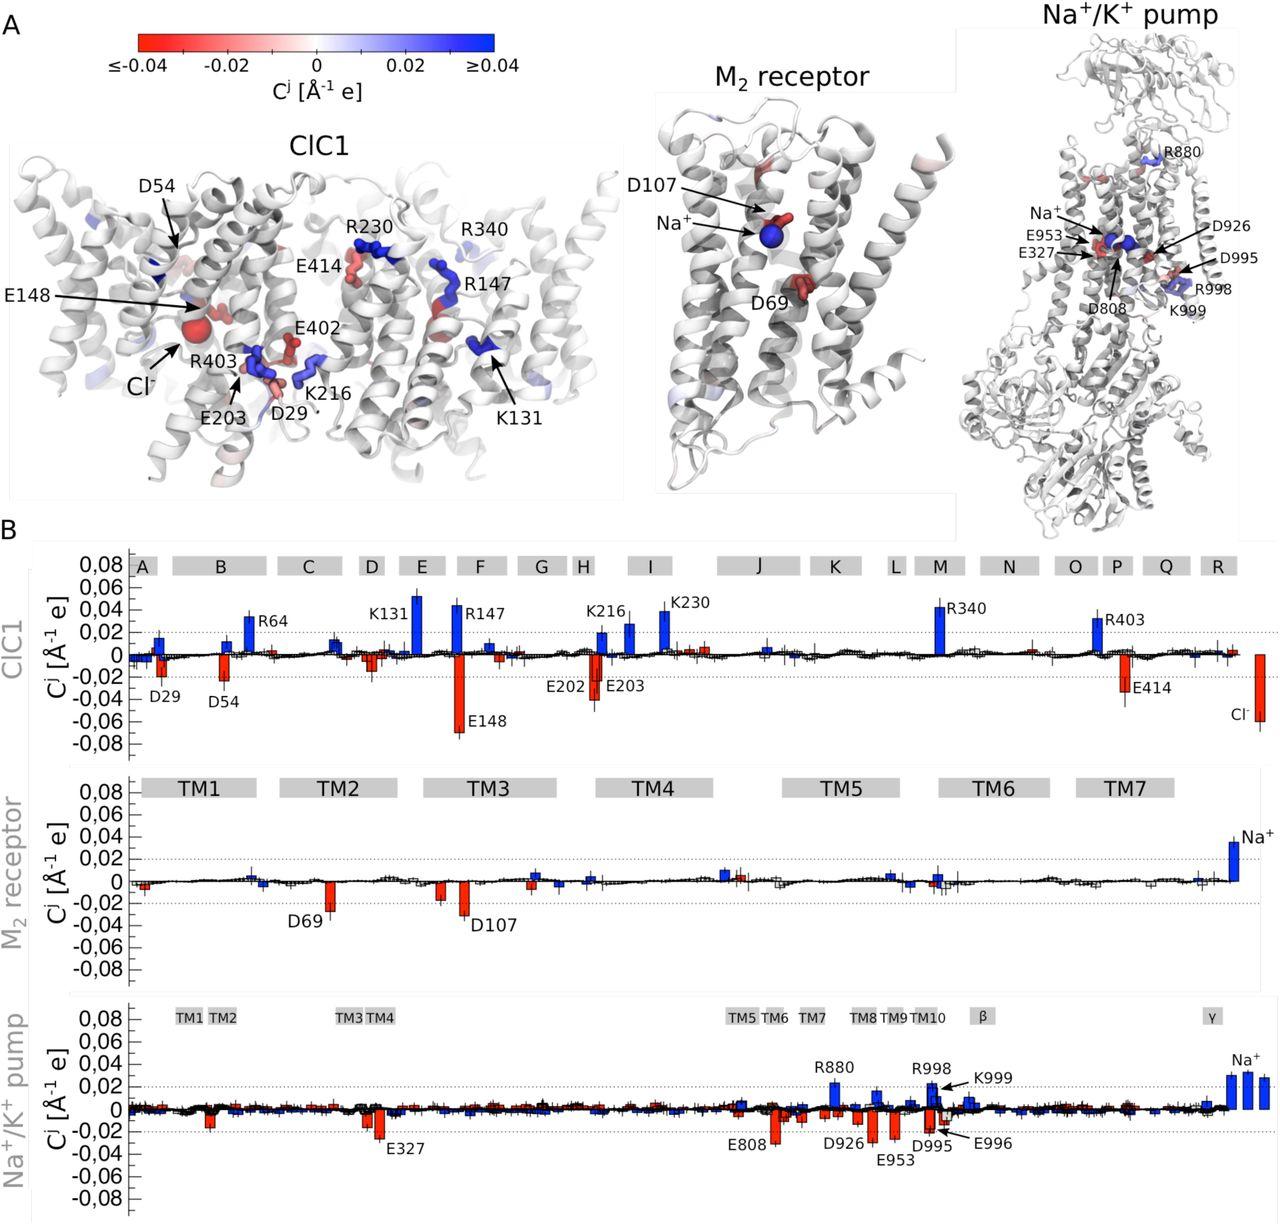 Molecular basis for voltage sensitivity in membrane proteins